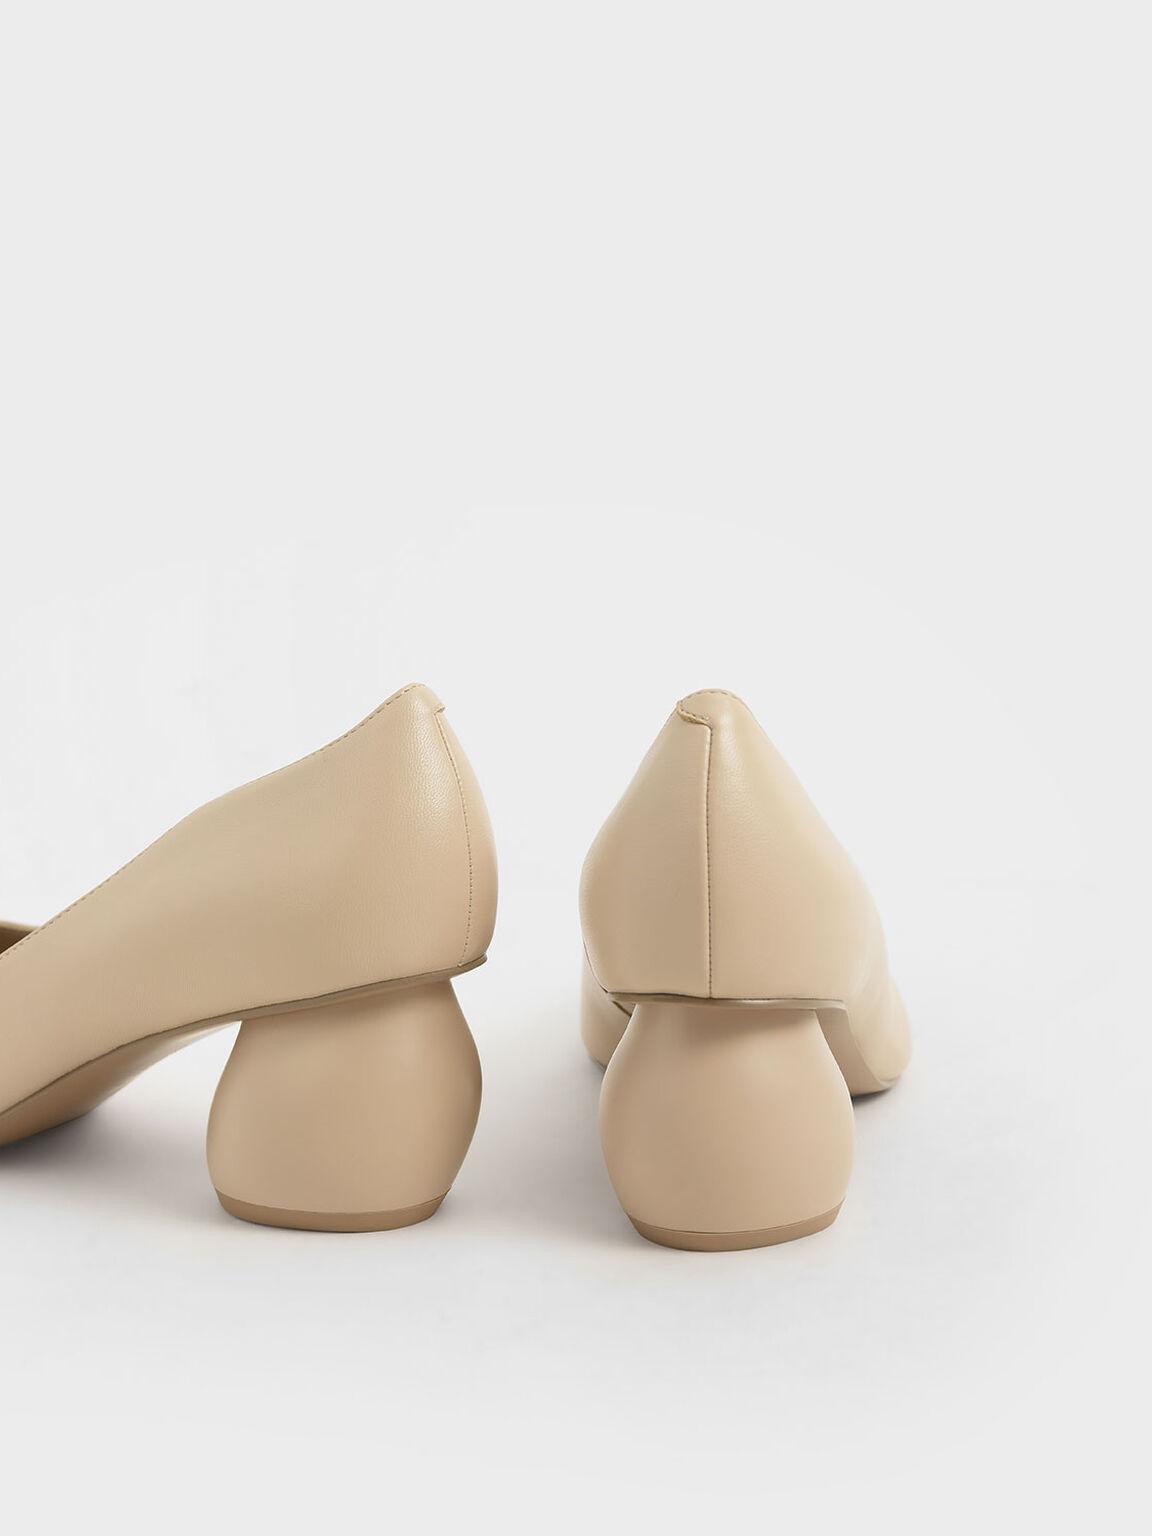 Sculptural Heel Pumps, Beige, hi-res